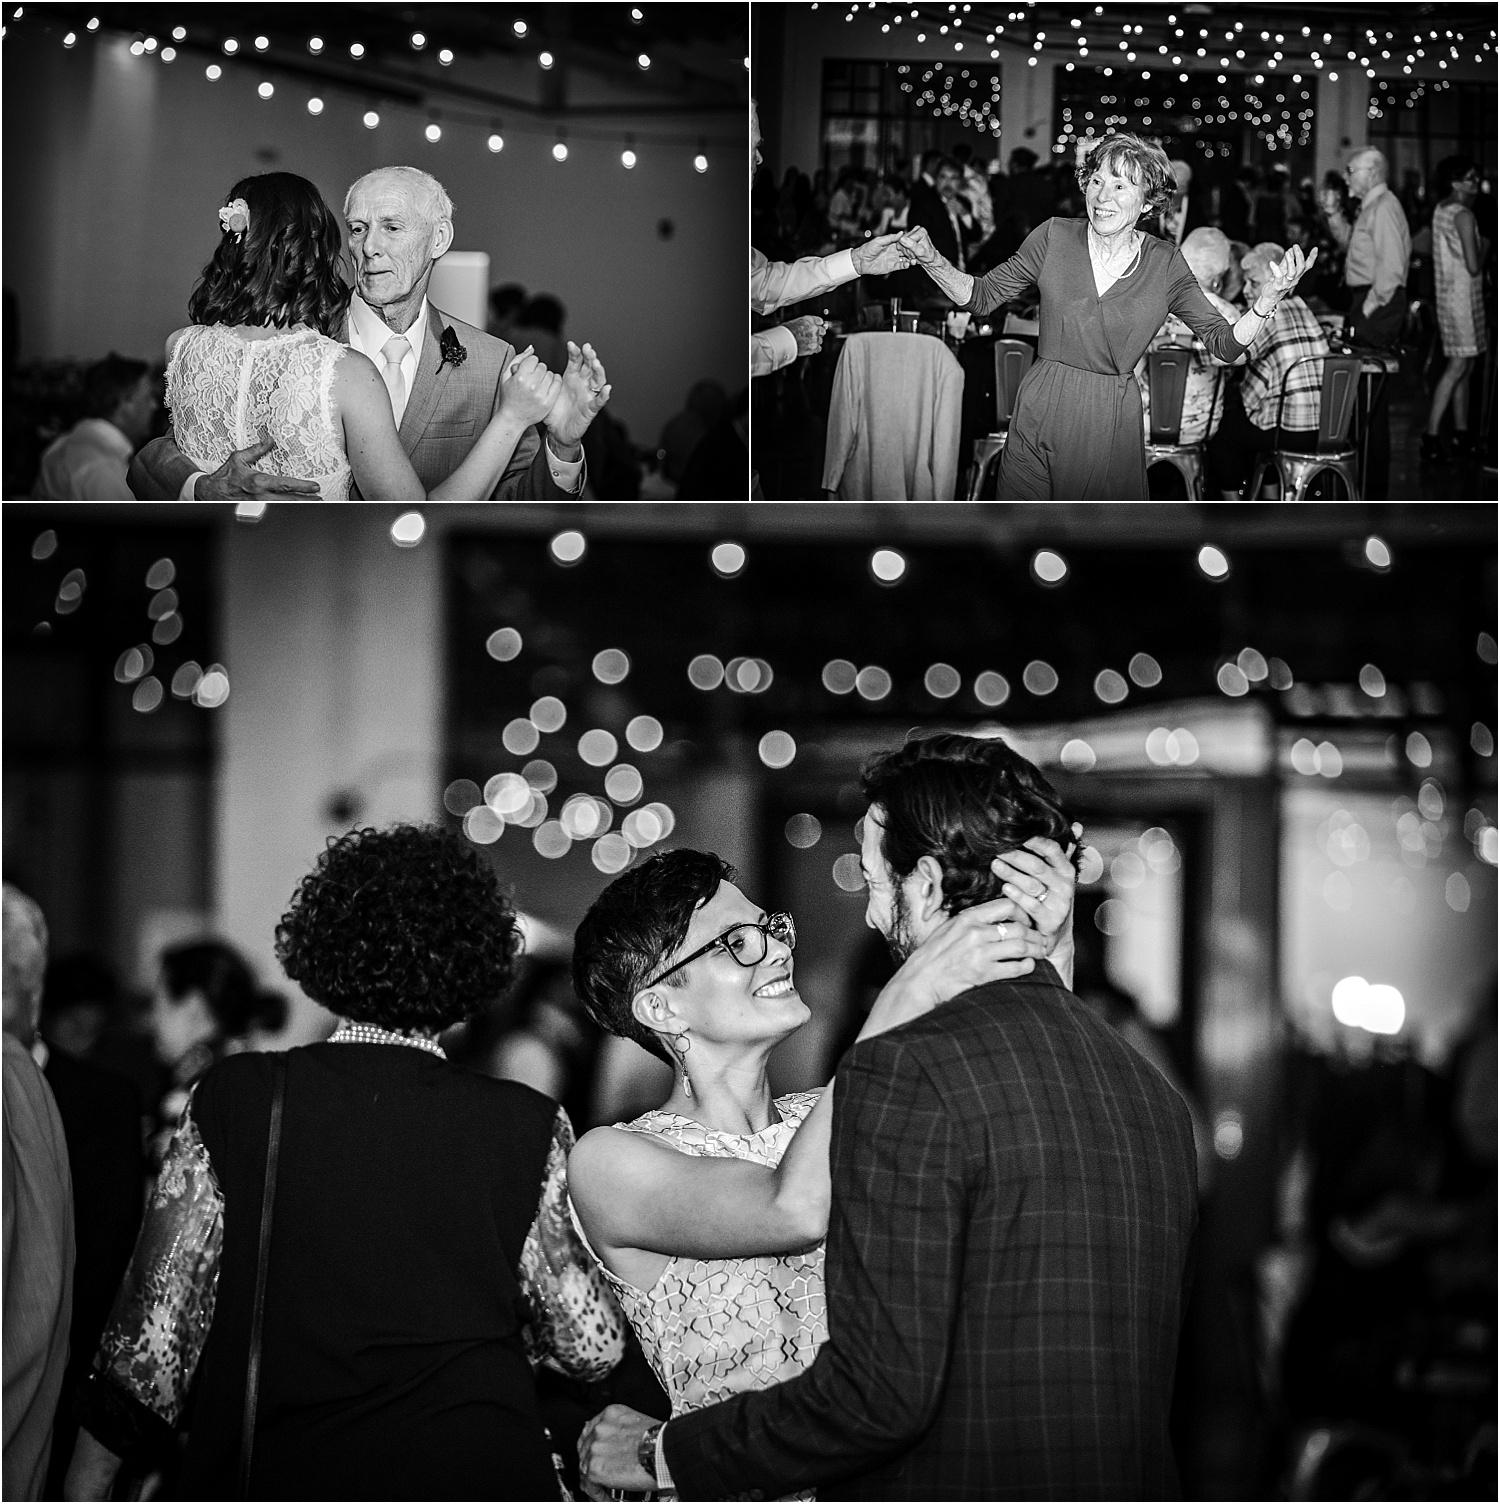 Denver_Wedding_Photography_Skylight_Urban_Venue_Modern_Bride_054.jpg